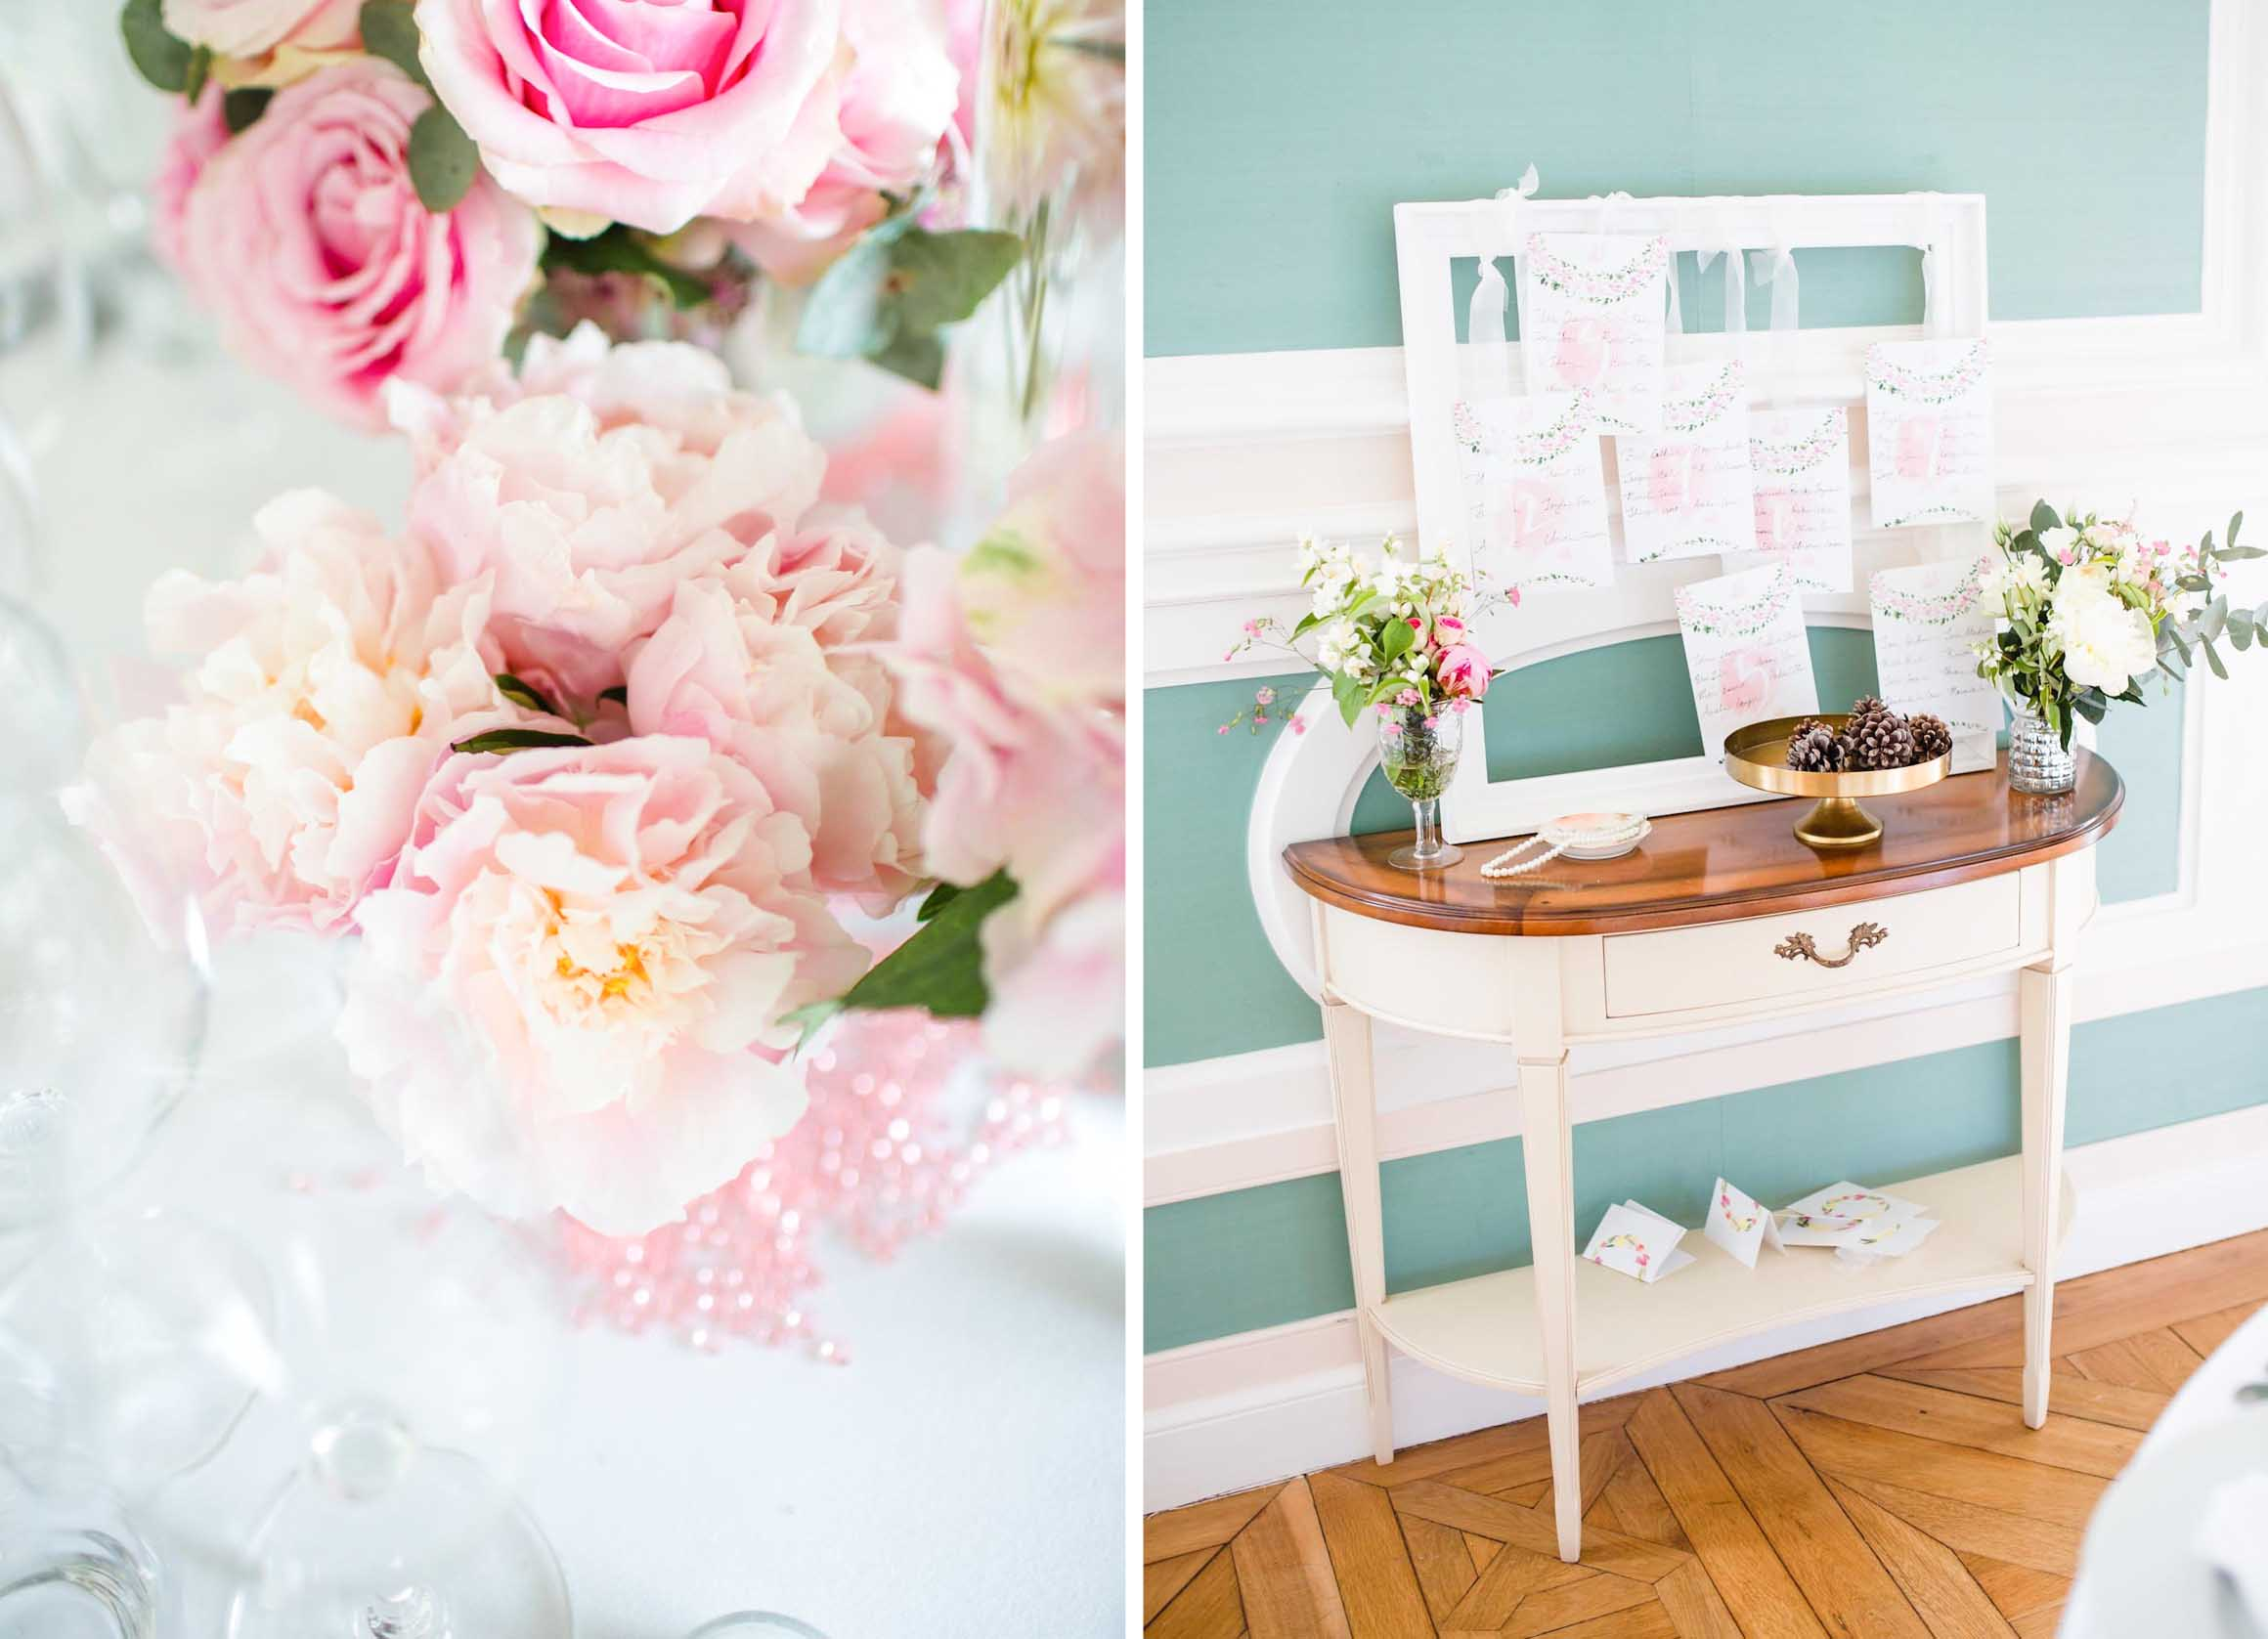 Amy O'Boyle Photography- Chateau Bouffemont Wedding- France Wedding Photographer 8.jpg